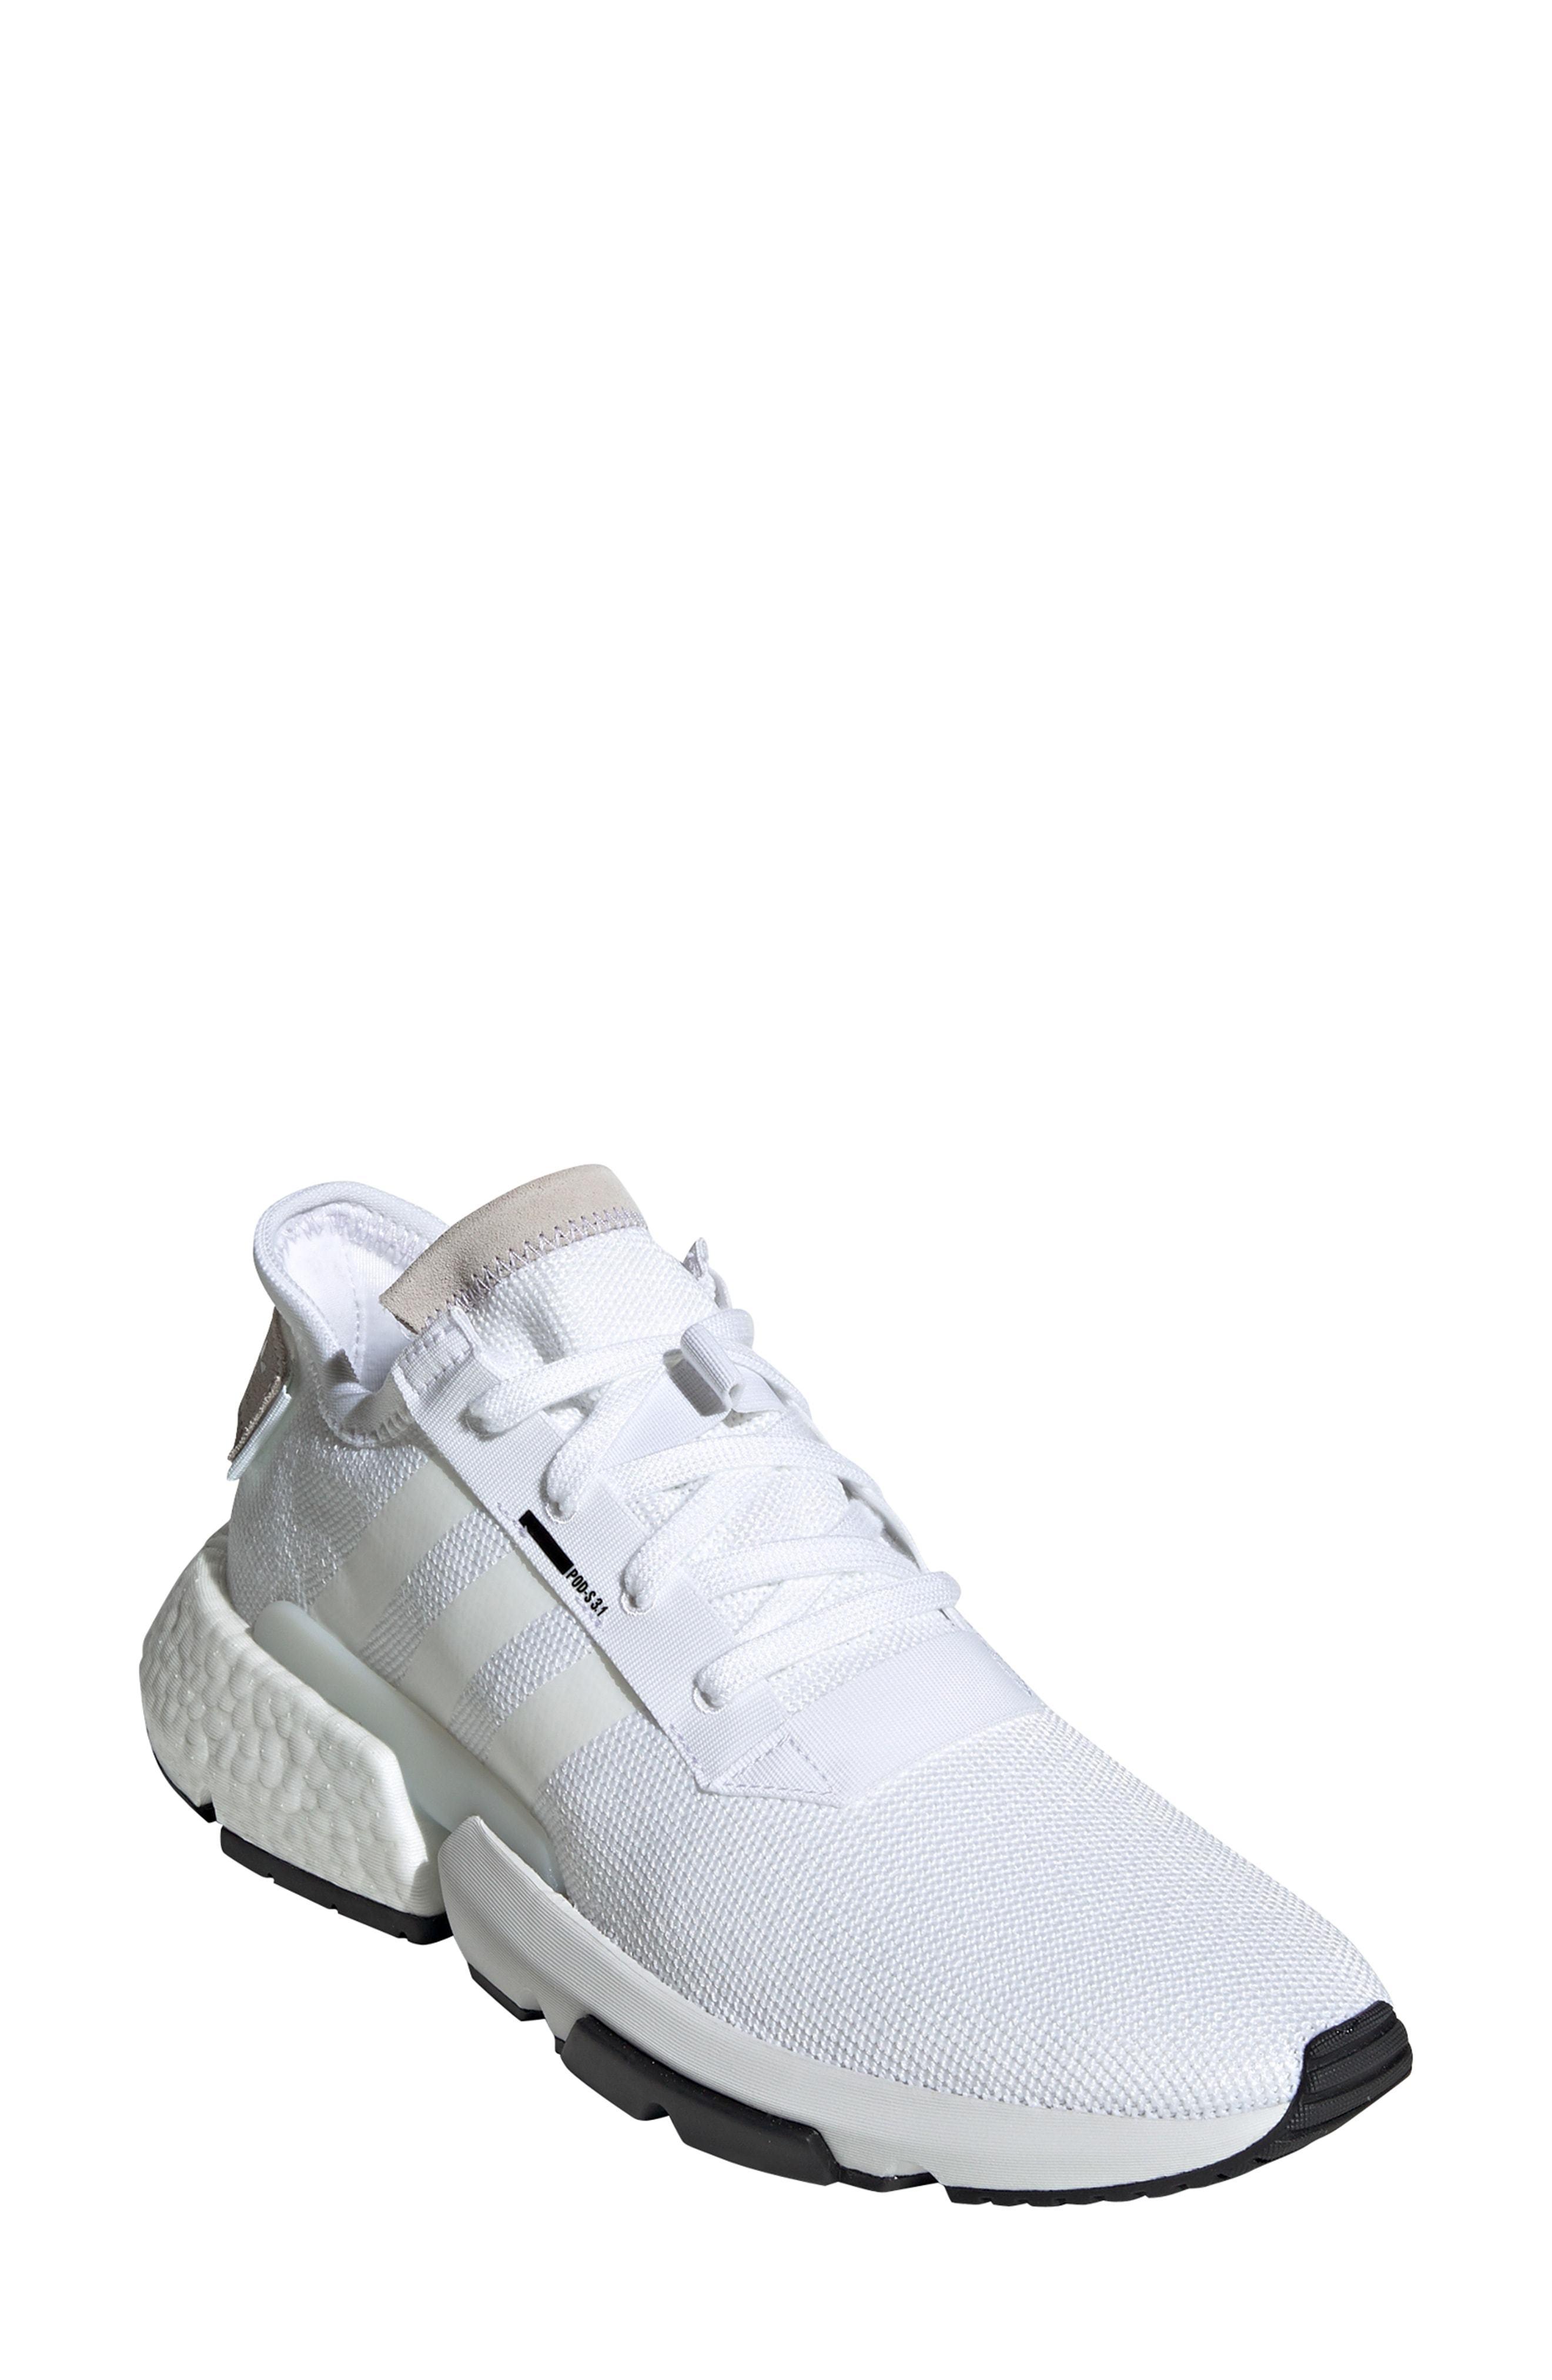 super popular 3a157 eb380 ... adidas Pod S31 Sneaker